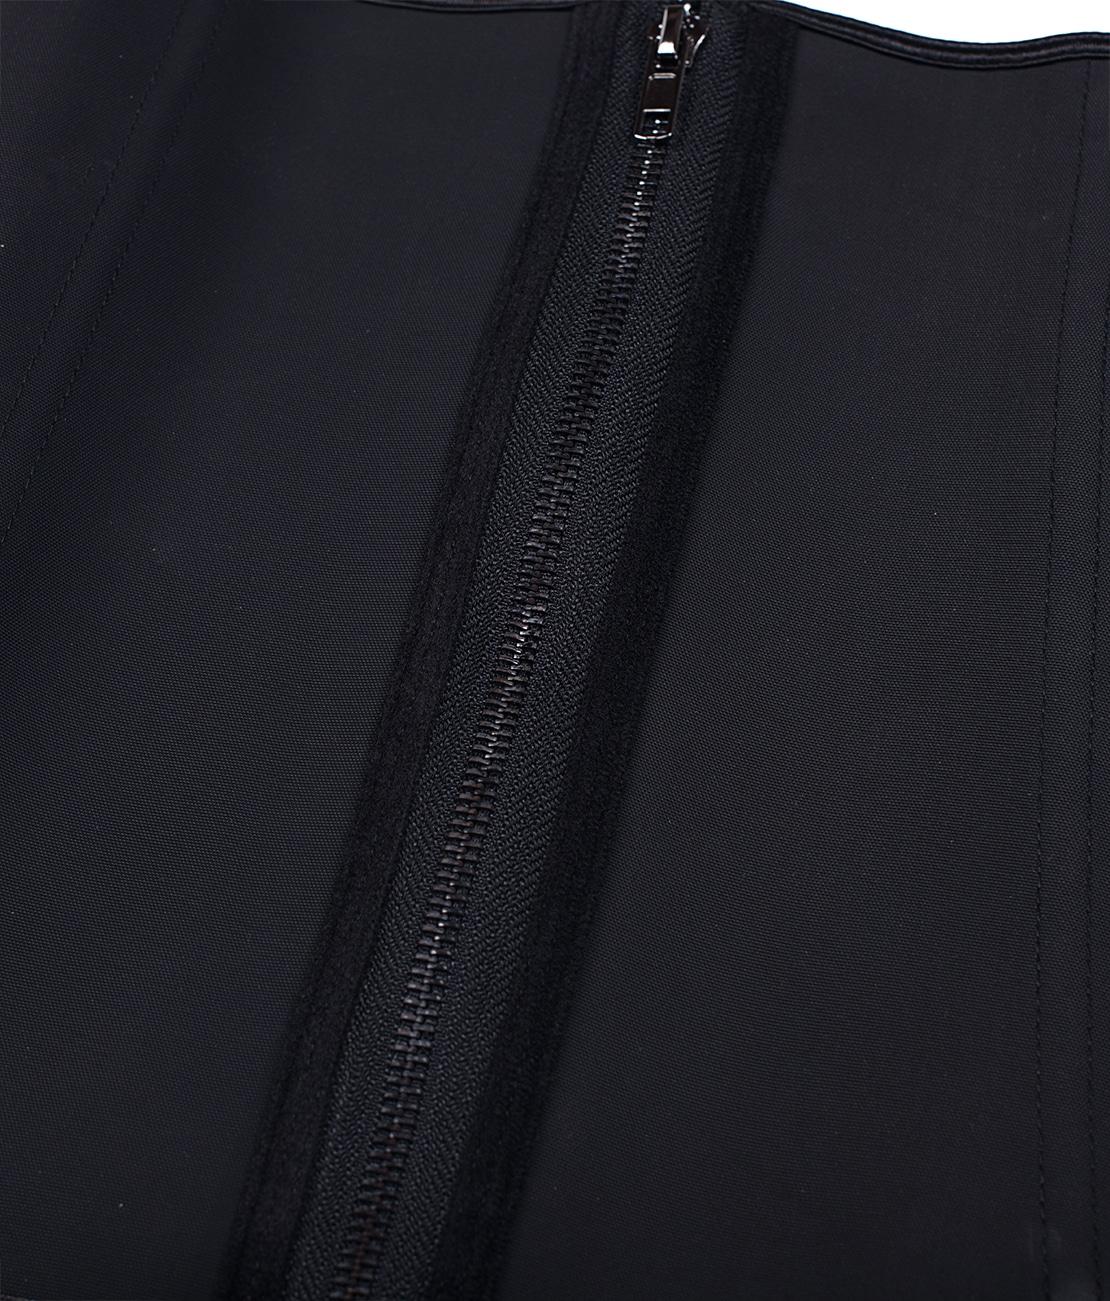 Gaine Femme Noir Packshot Detail 2